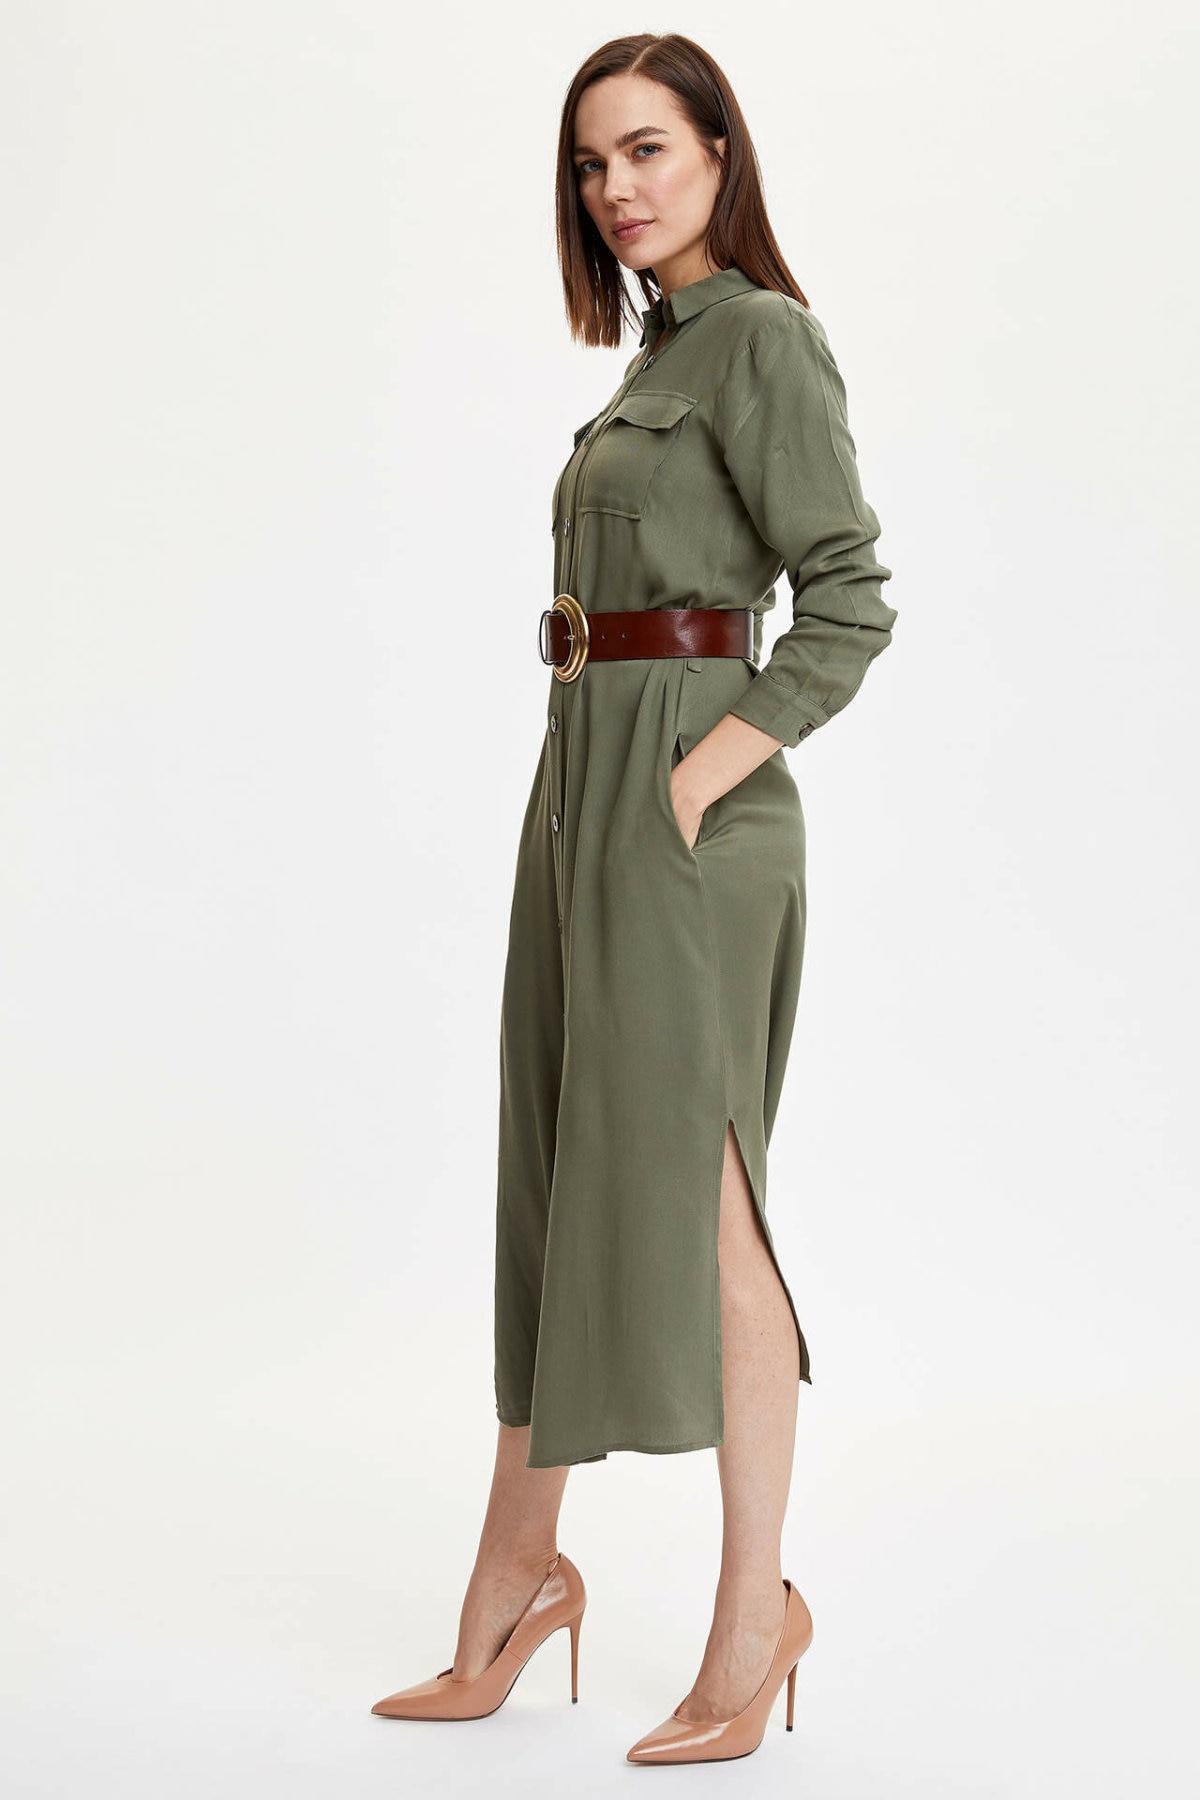 DeFacto Woman Woven Dress Women Spring Long Dresses Women Casual Basic Color Shirt Dress Women Elegant Dresses-M9356AZ20SP